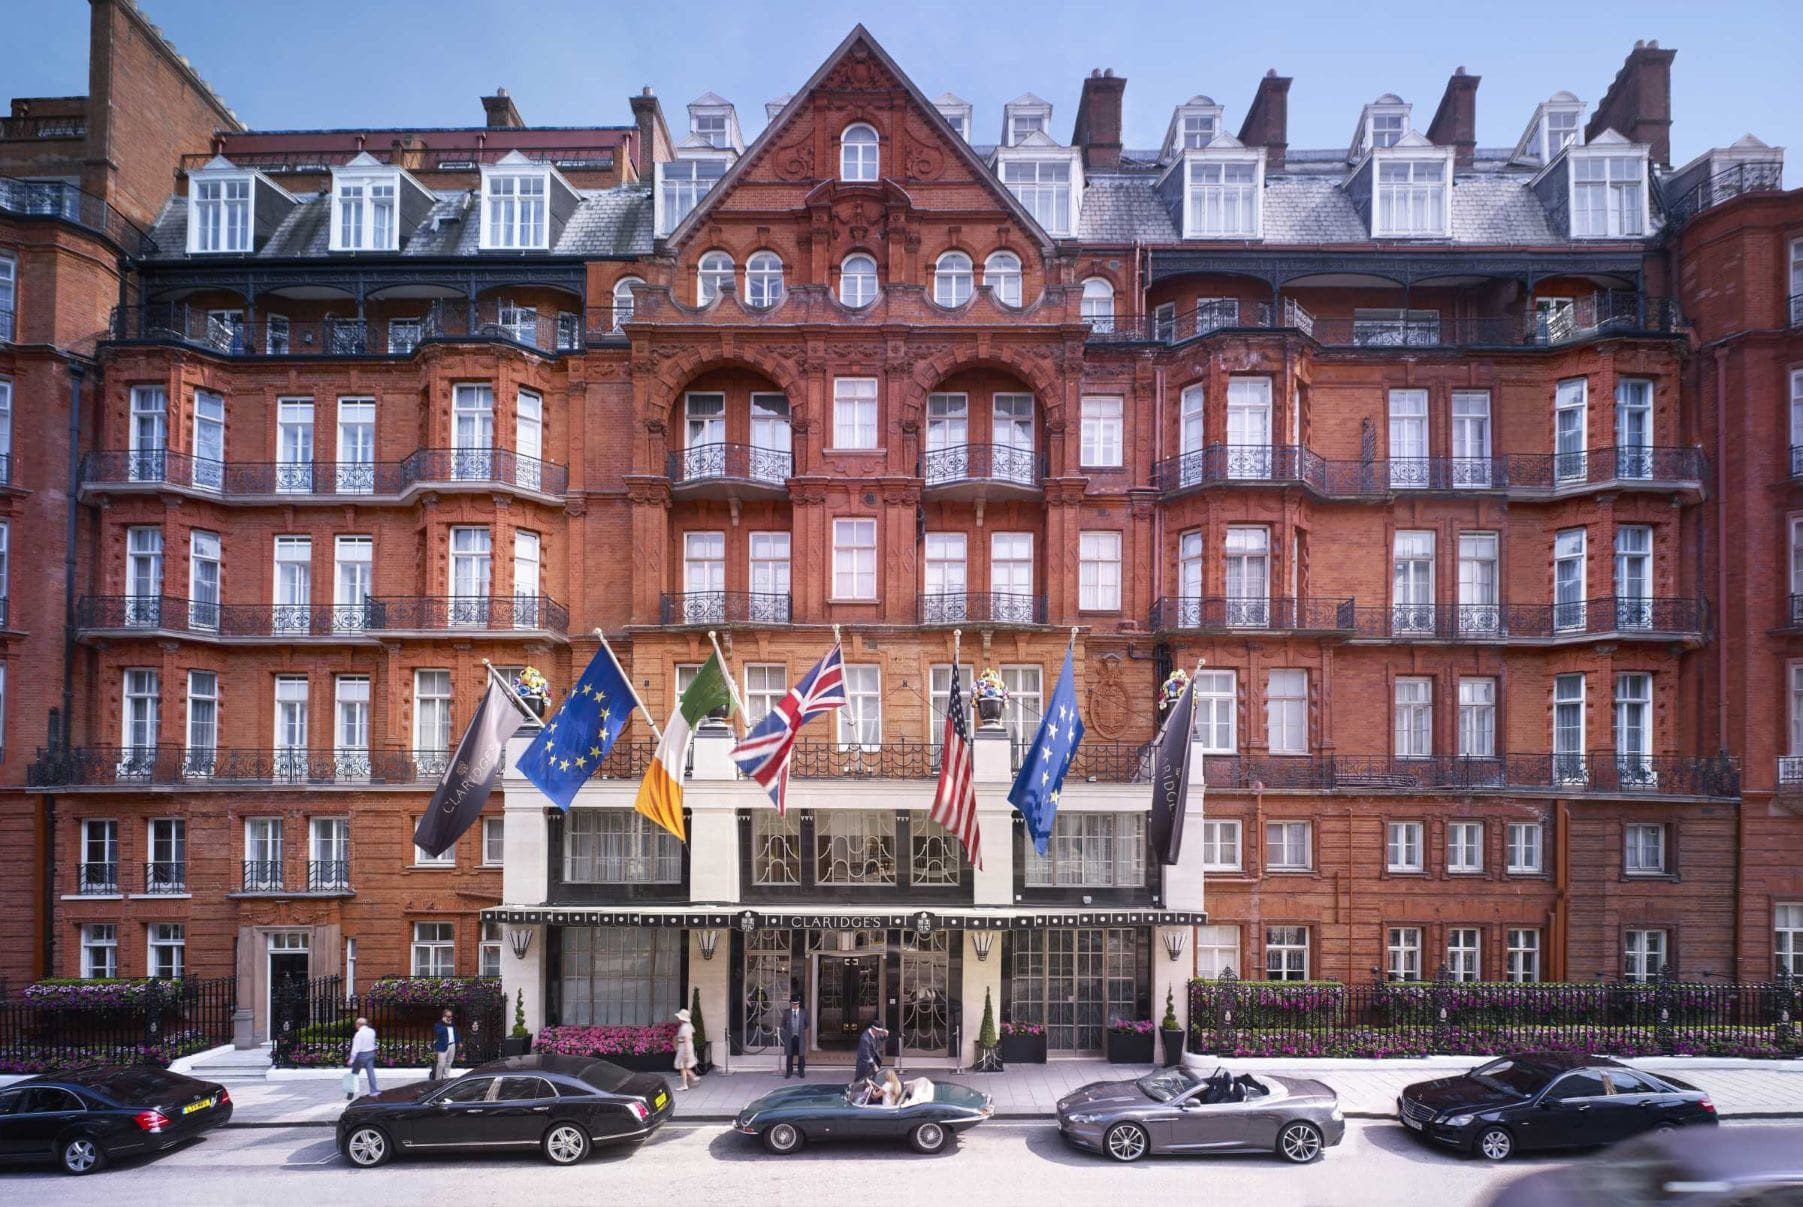 Claridge's London Hotel facade